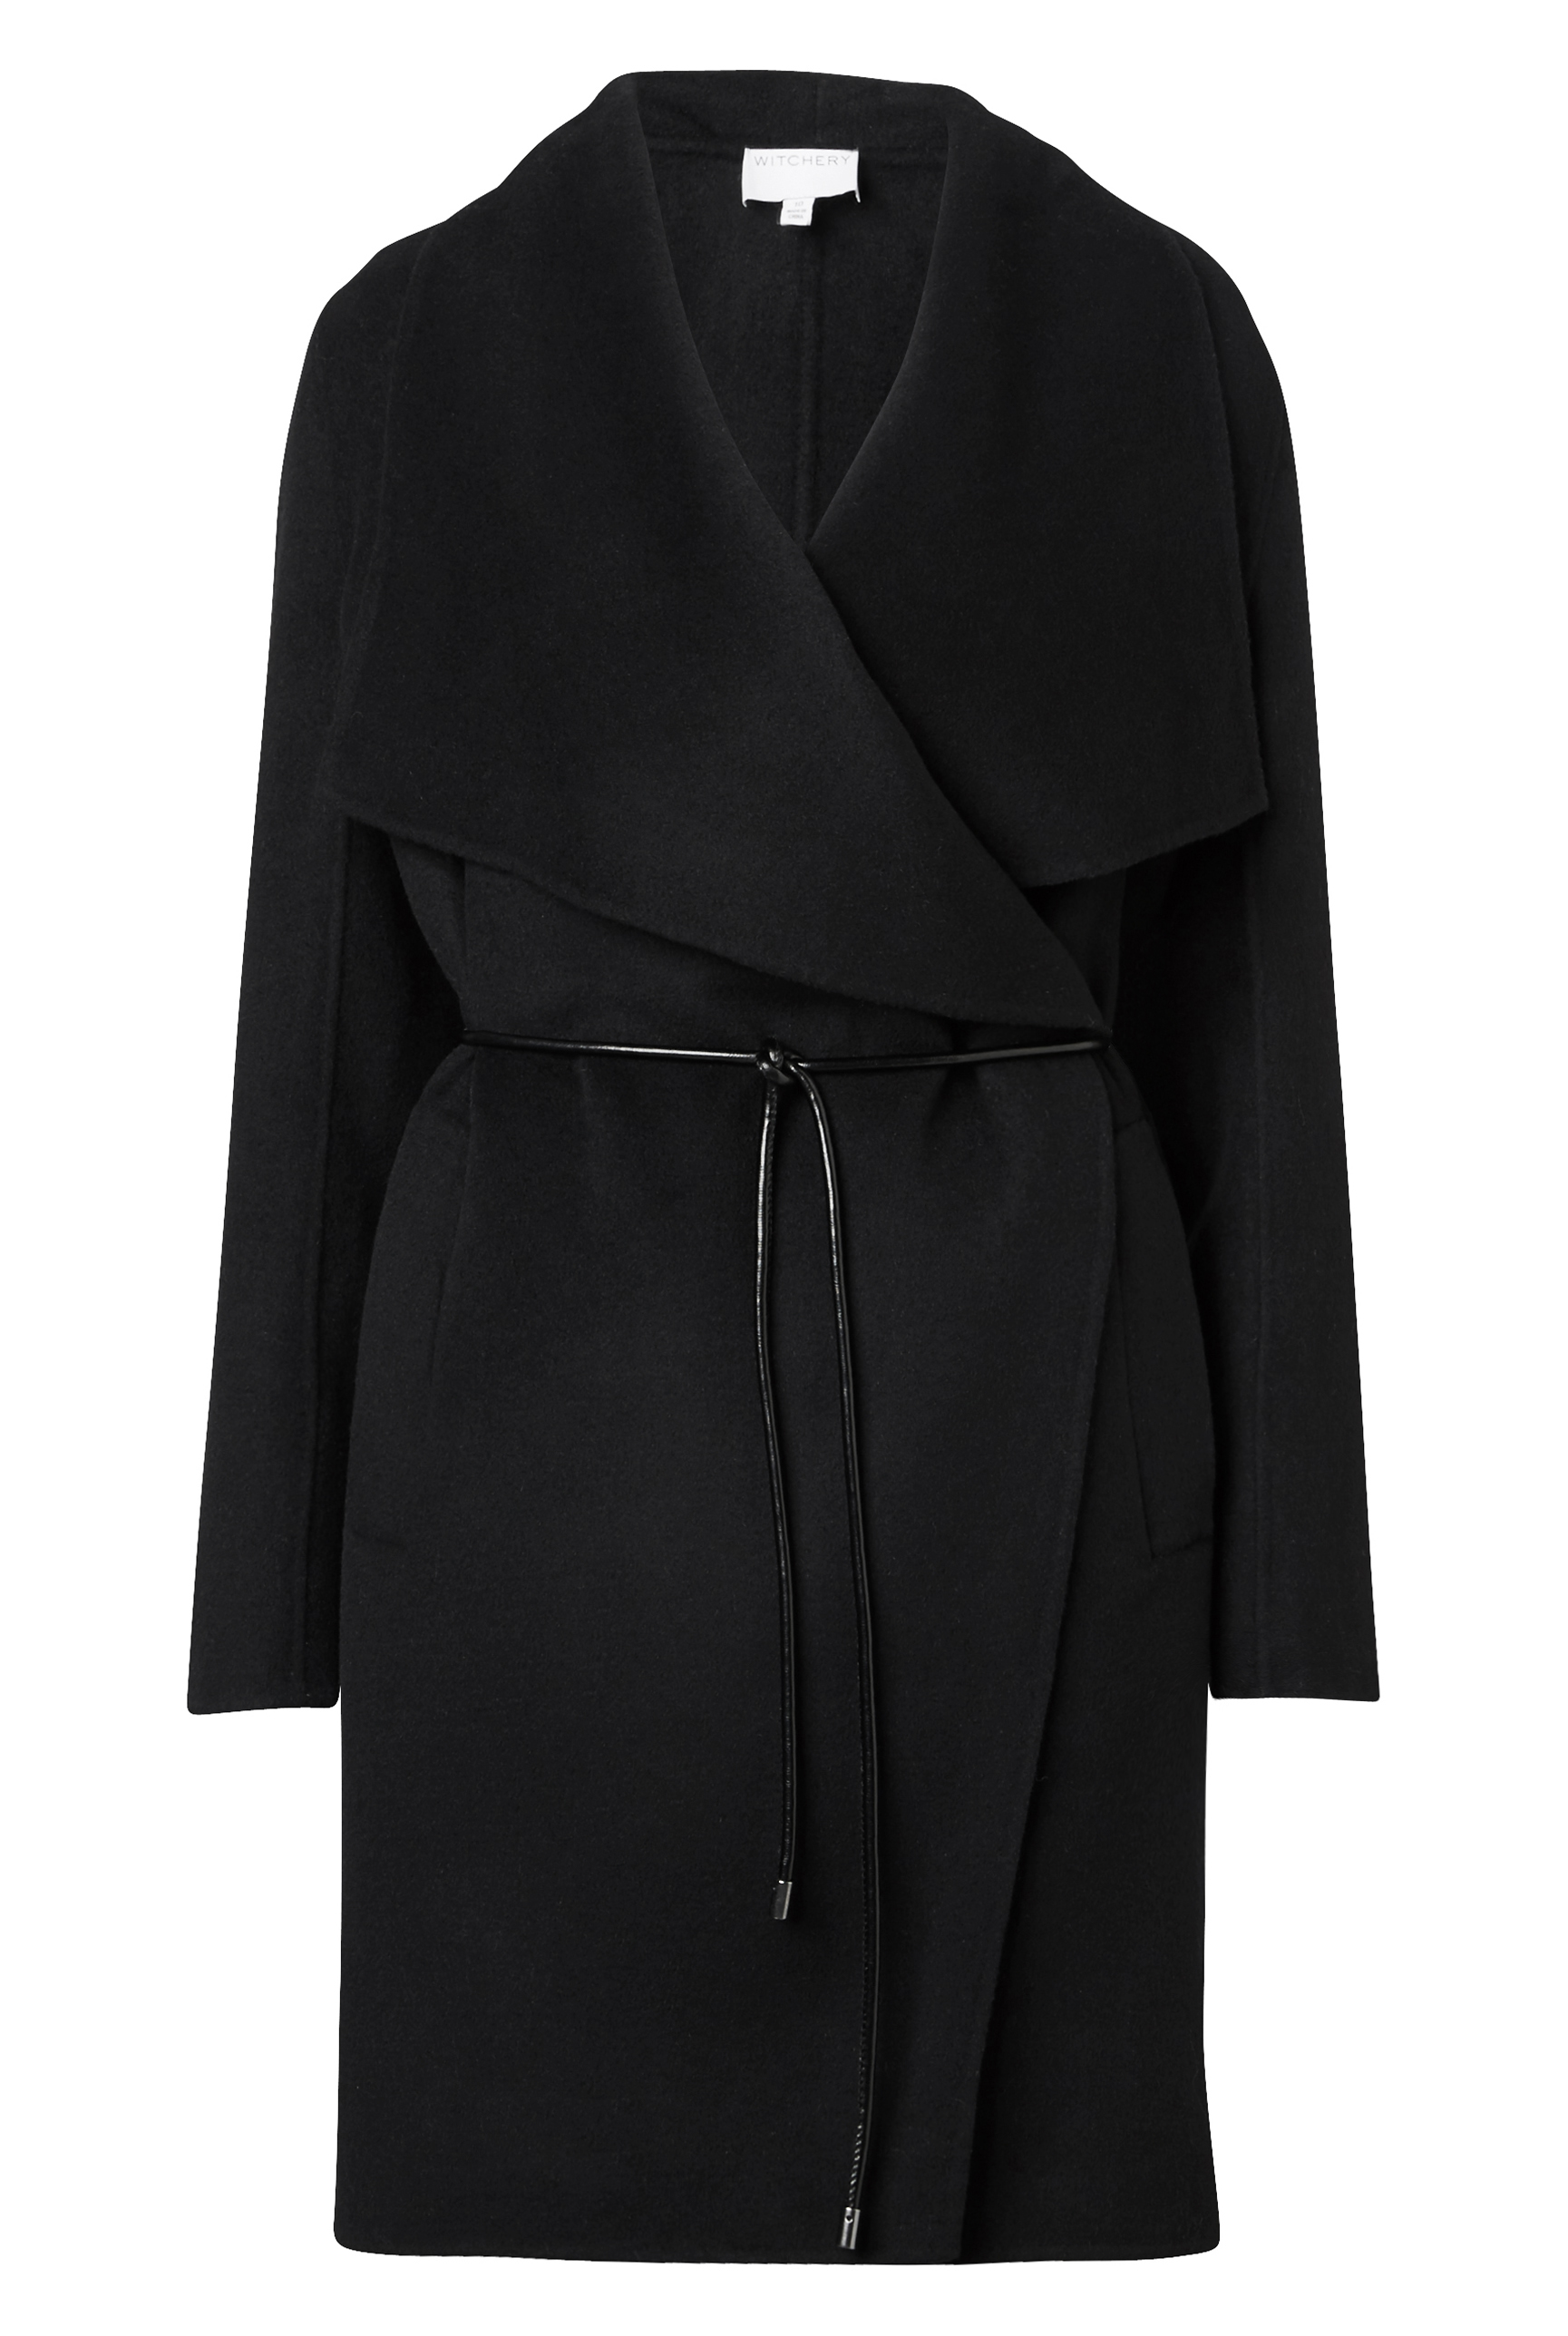 60193698_Witchery Tie Wrap Coat, RRP$449.90